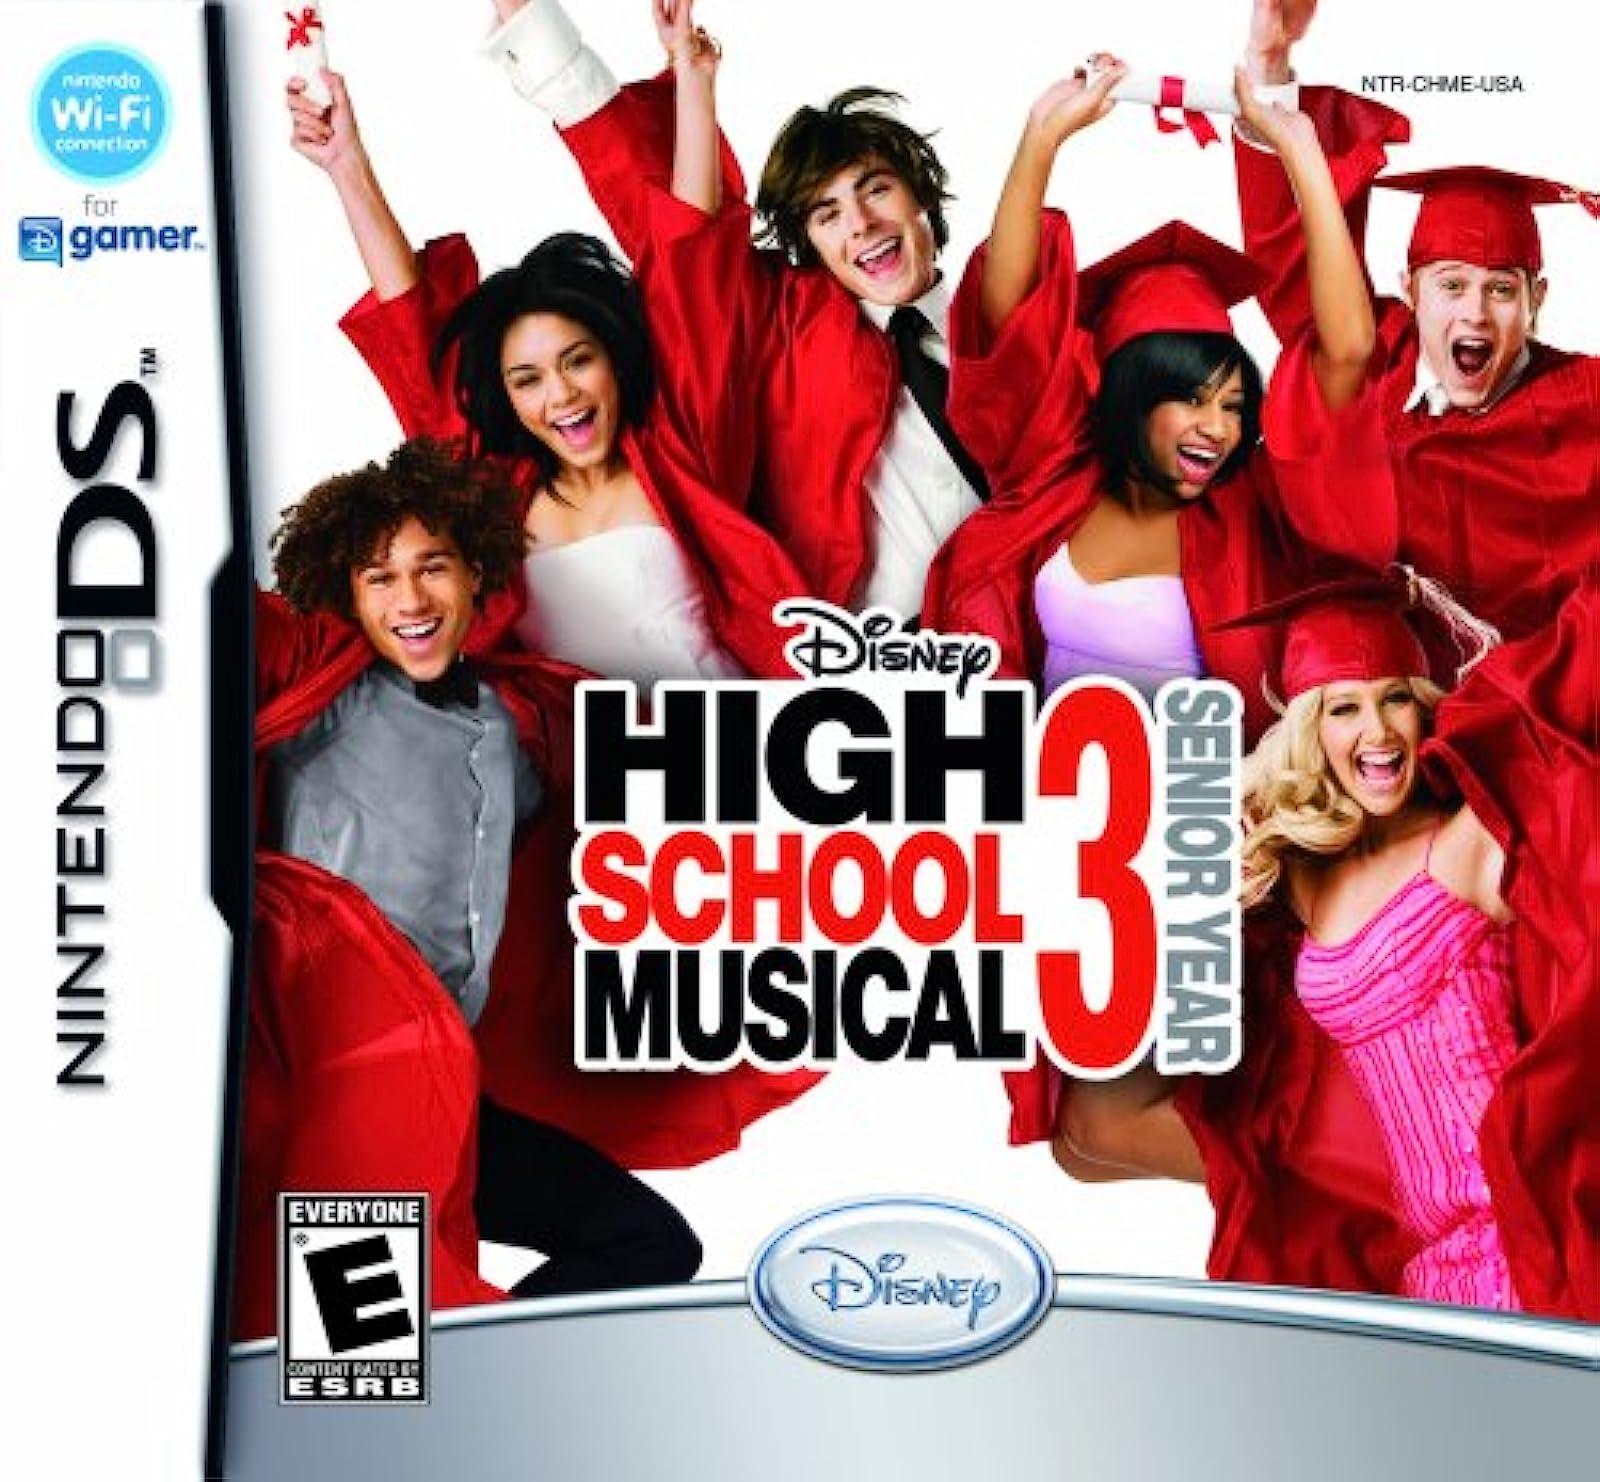 Disney High School Musical 3: Senior Year For Nintendo DS DSi 3DS 2DS